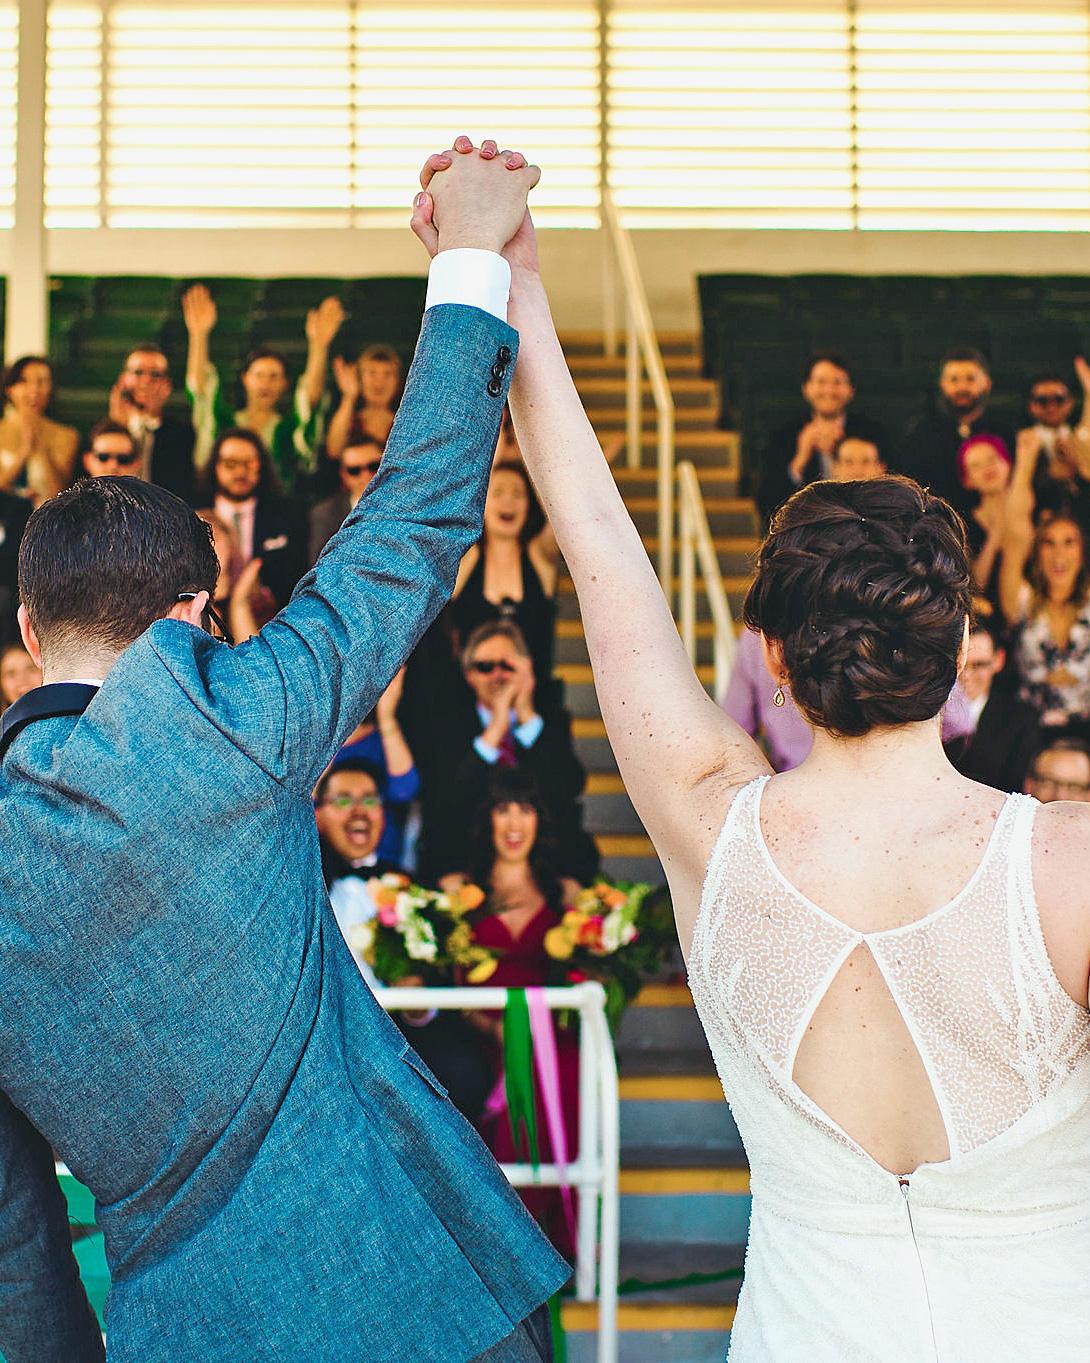 becca zac wedding ceremony hands up